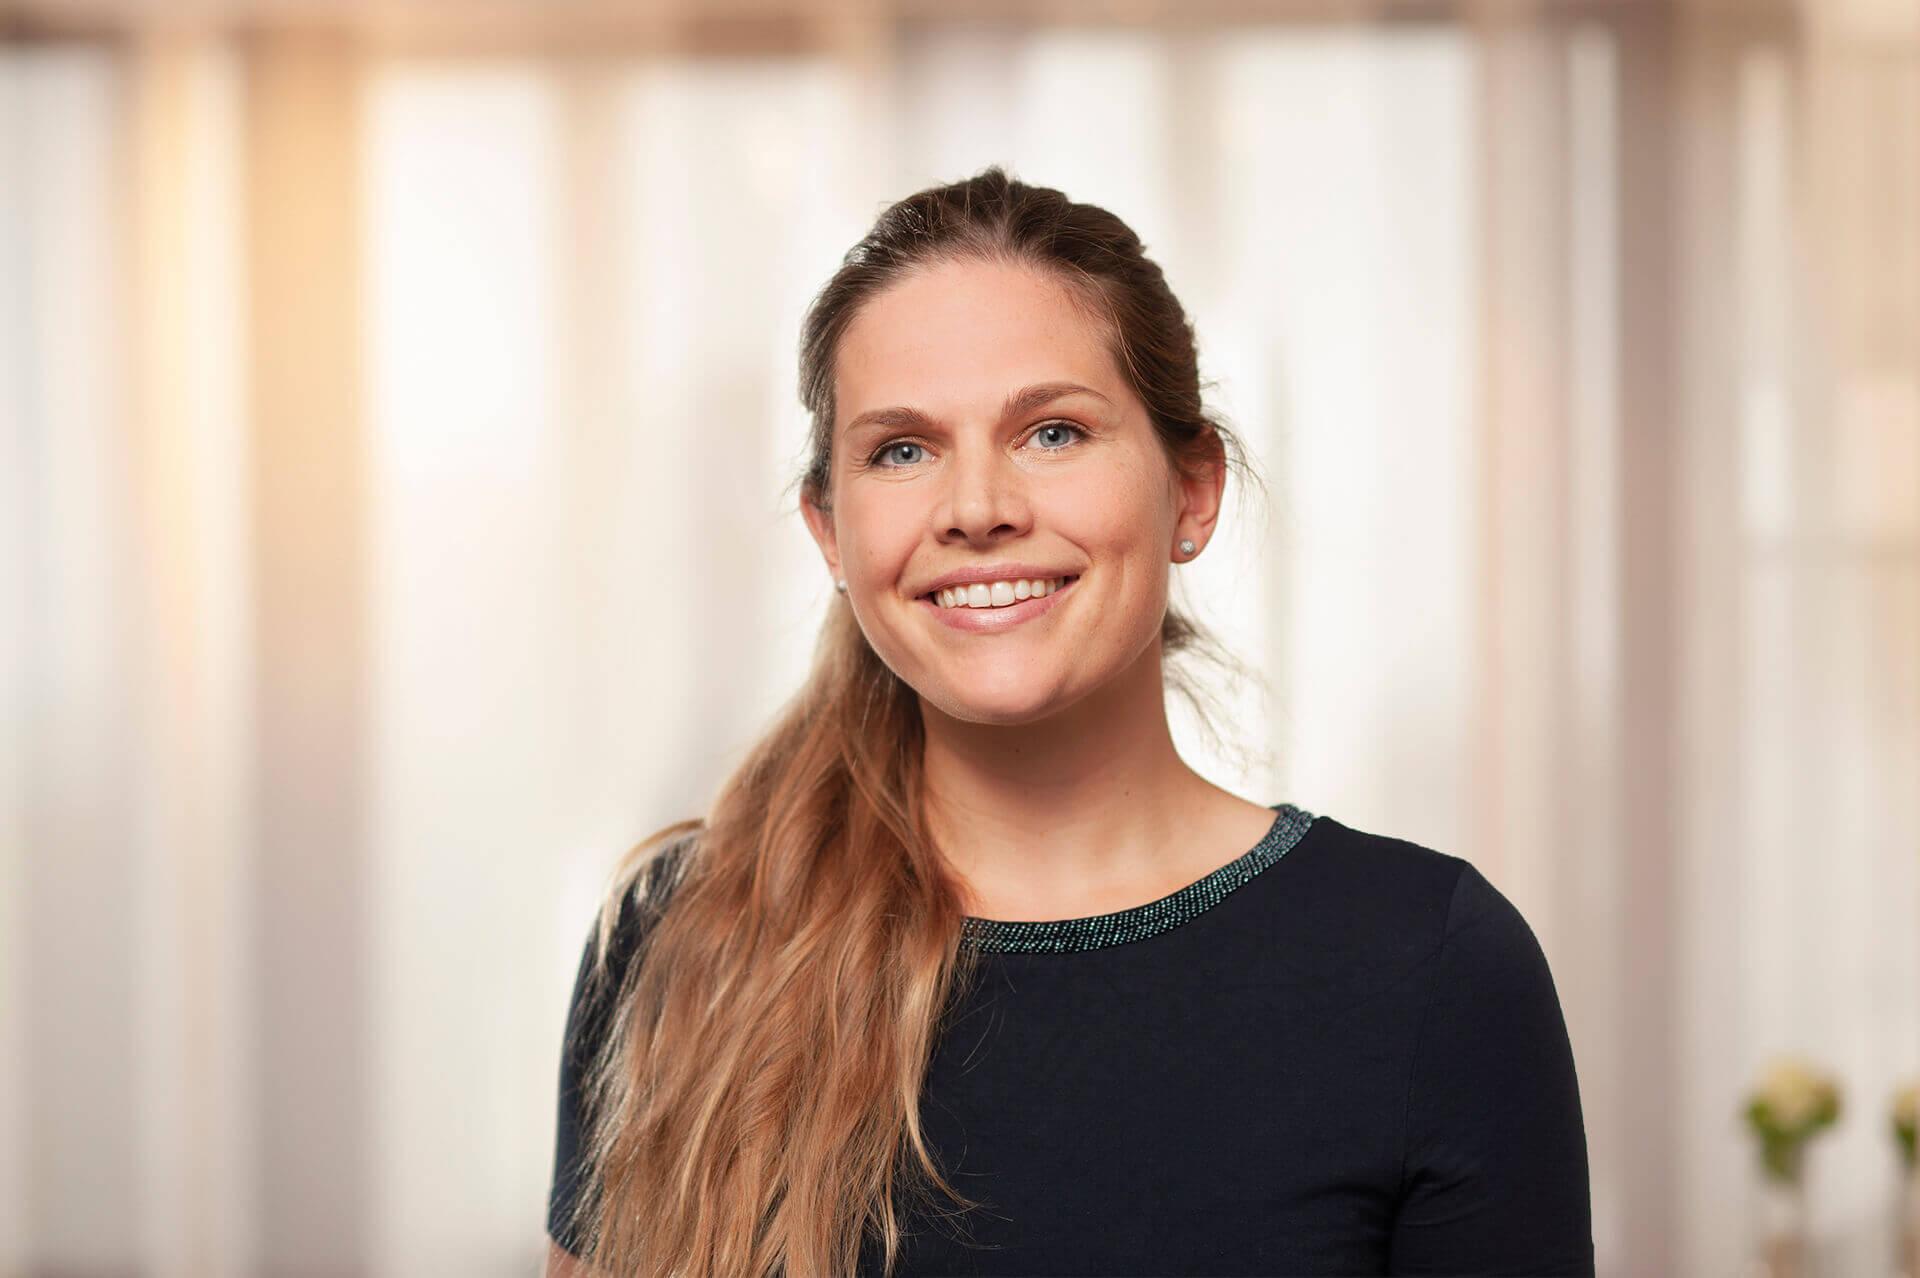 Dipl.-Psychologin Lisa Thron - Psychotherapeutin Essen